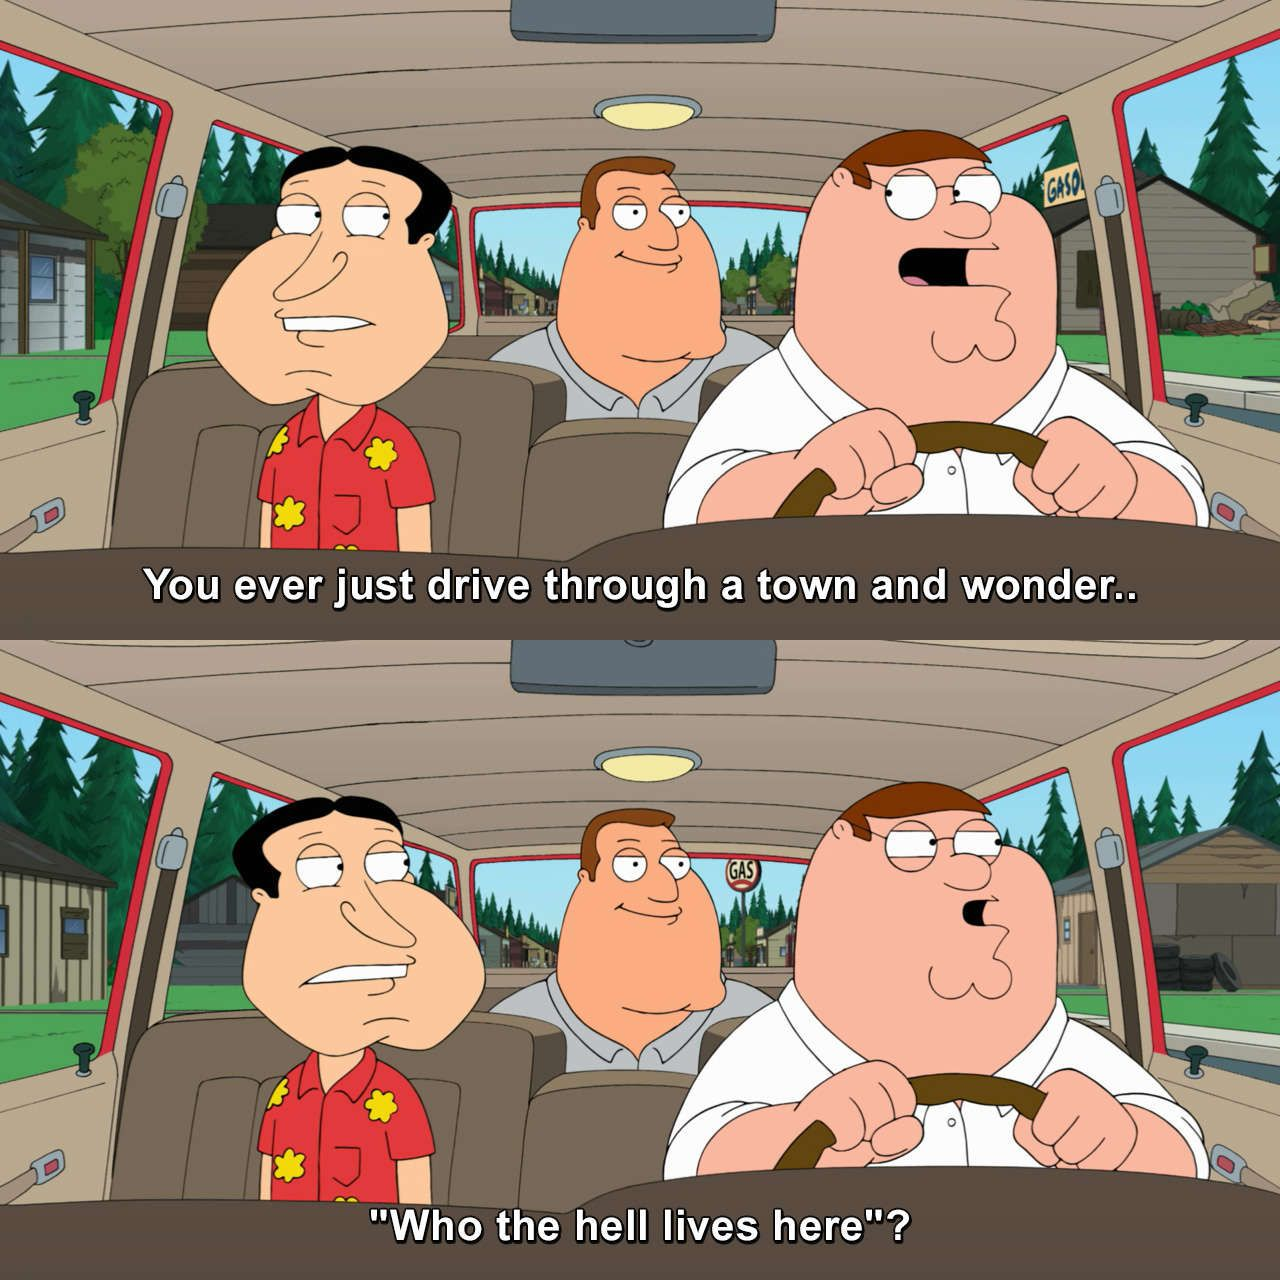 Family Guy Joes Revenge Petergriffin Familyguy Joesrevenge Lmao Joke Family Guy Funny Family Guy Quotes Family Guy